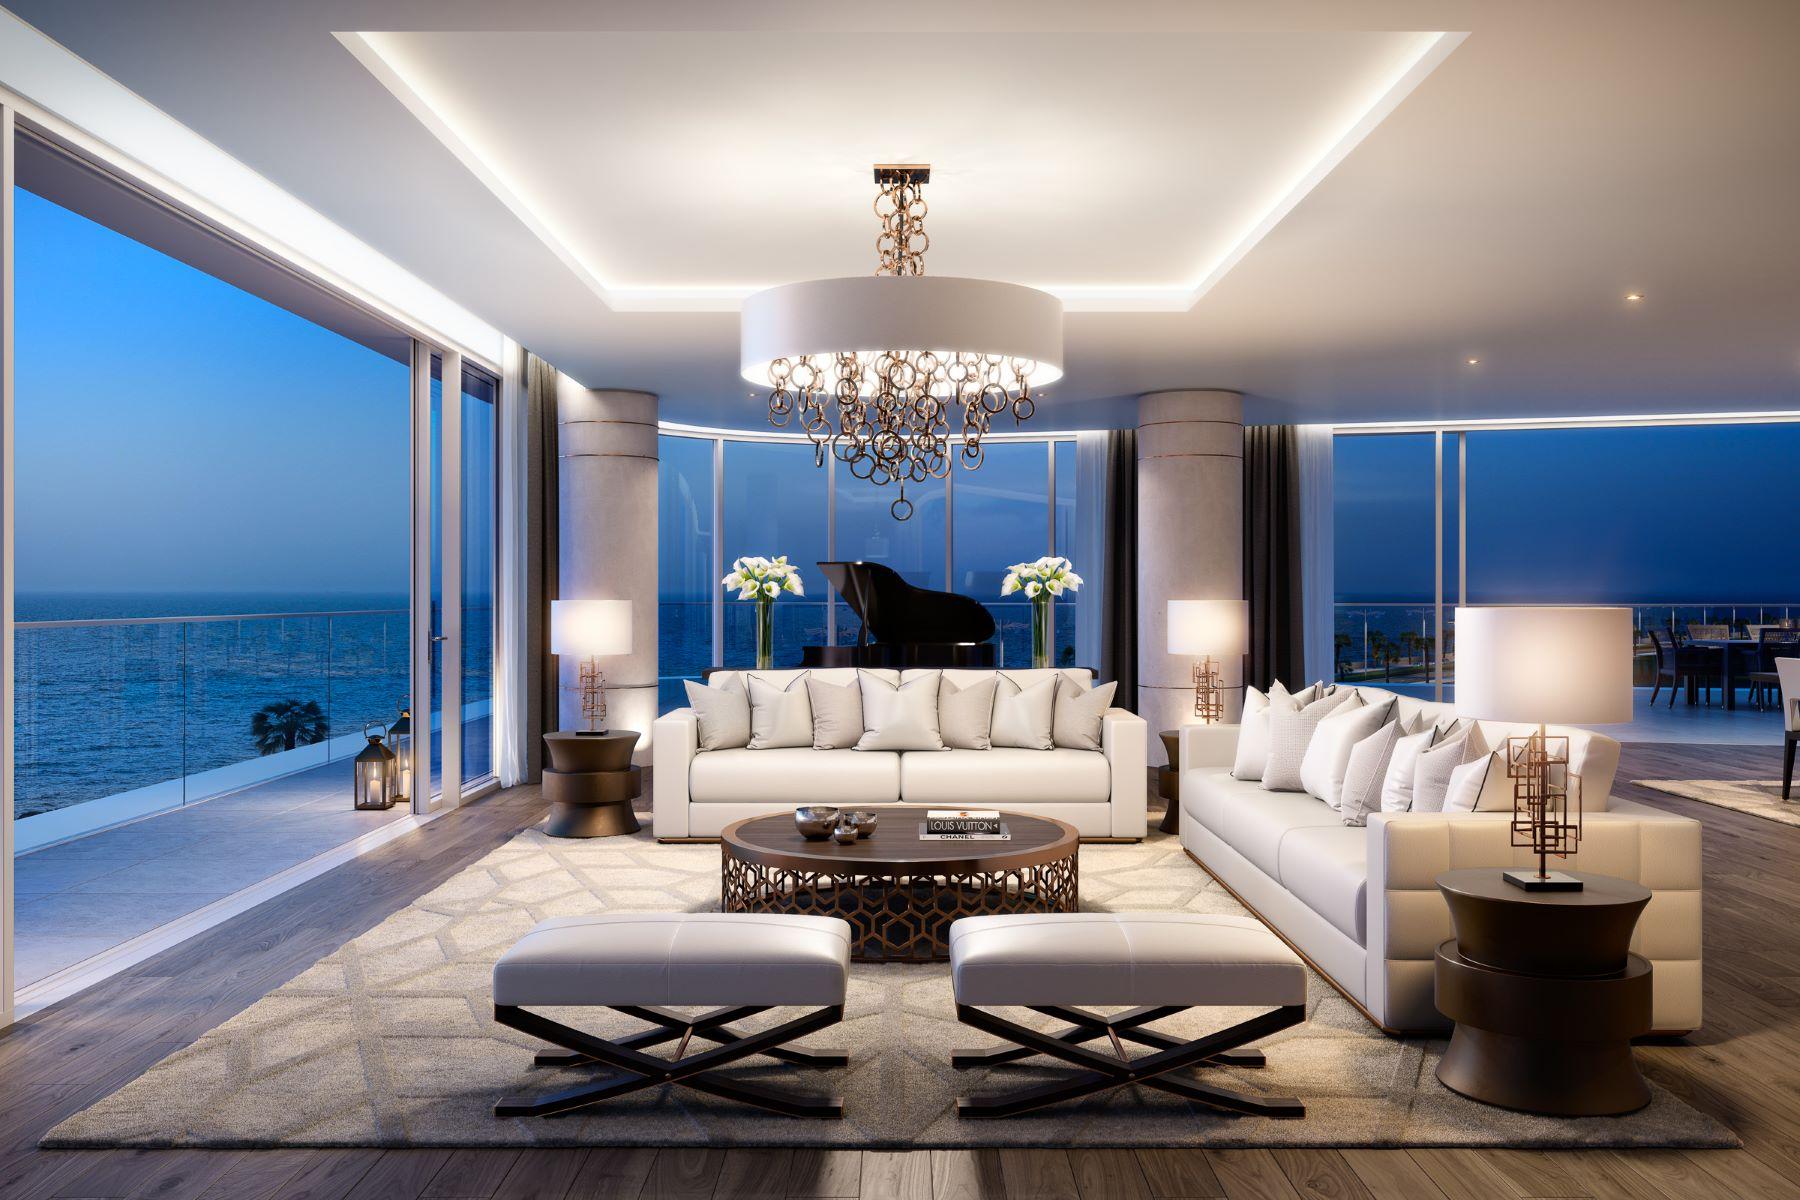 Apartments for Sale at Stunning Penthouse at W Residences Dubai - The Palm Dubai, Dubai United Arab Emirates